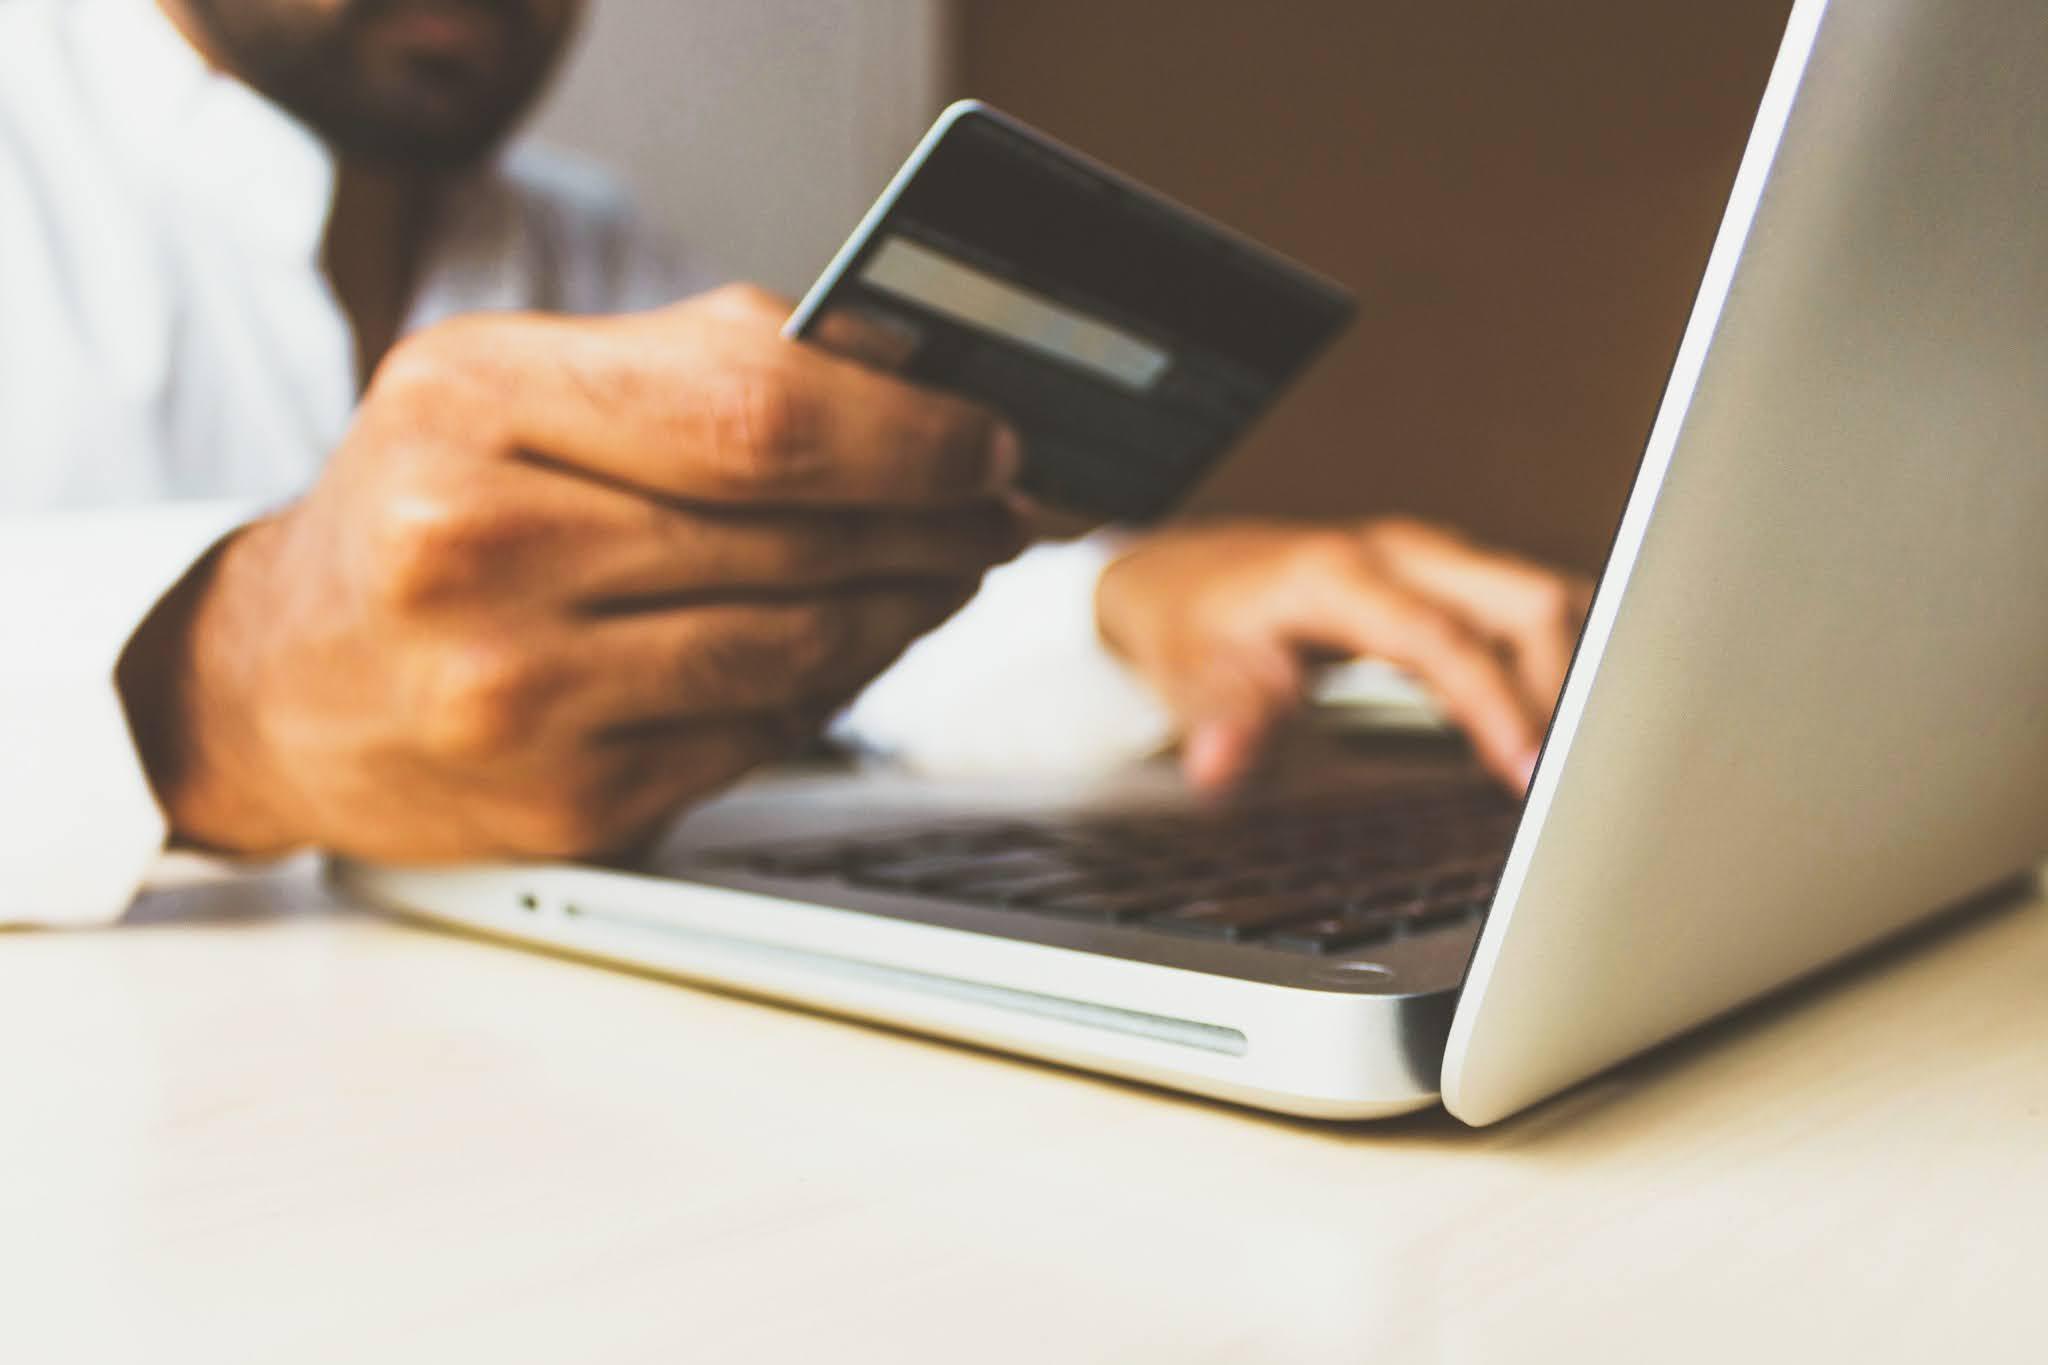 5 Macam Sumber Pendapatan Biar Gak Cuma Mengandalkan Gaji Bulanan